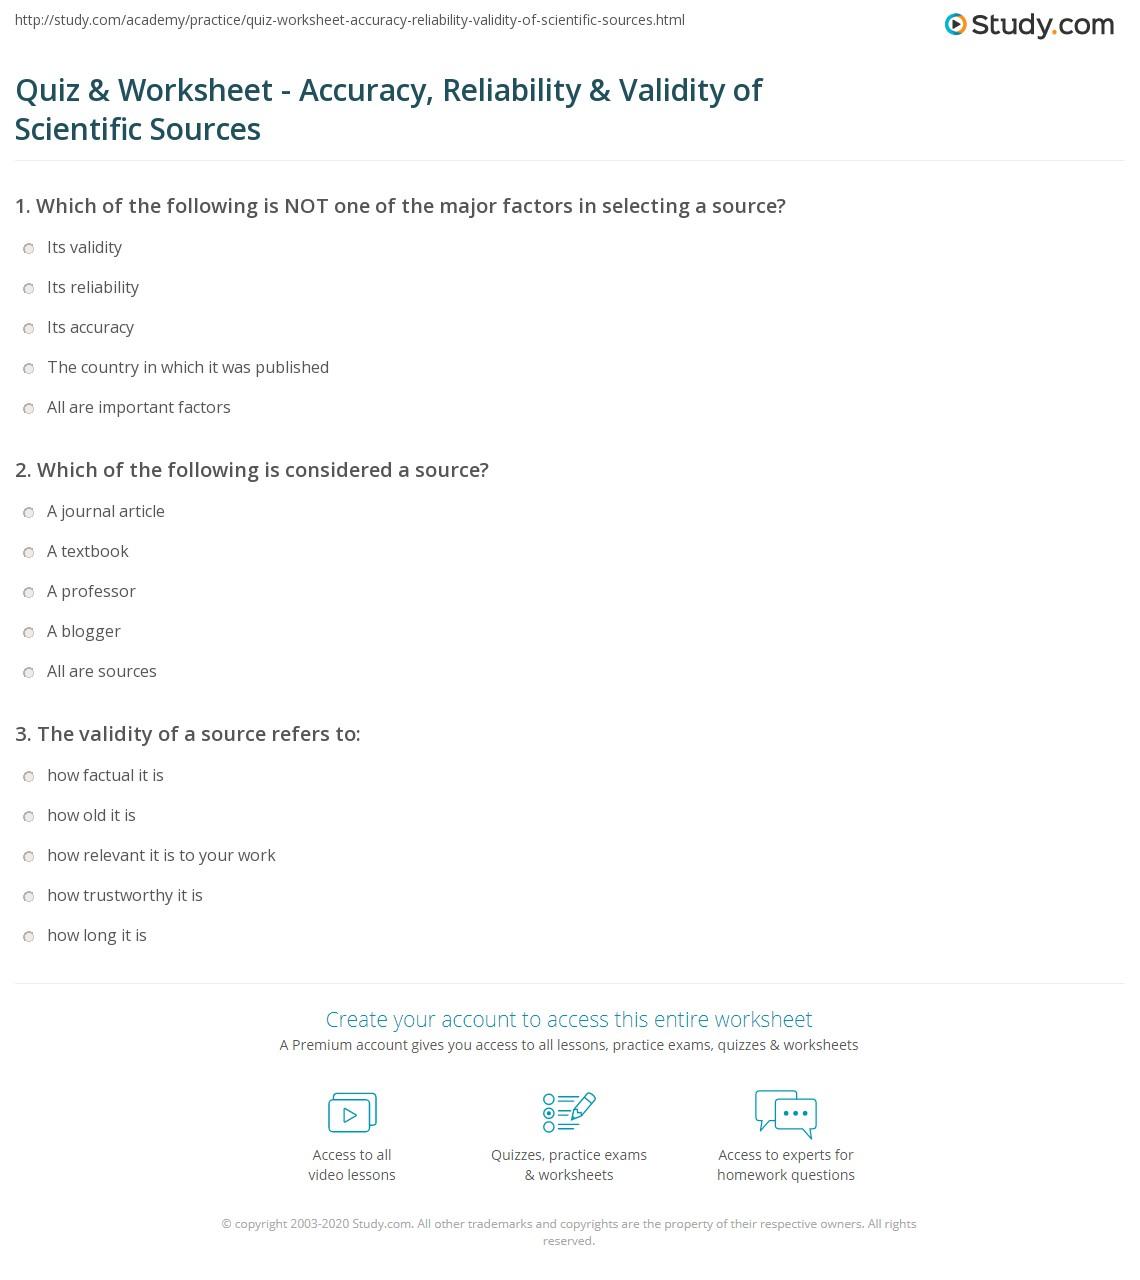 Quiz Worksheet Accuracy Reliability Validity Of Scientific